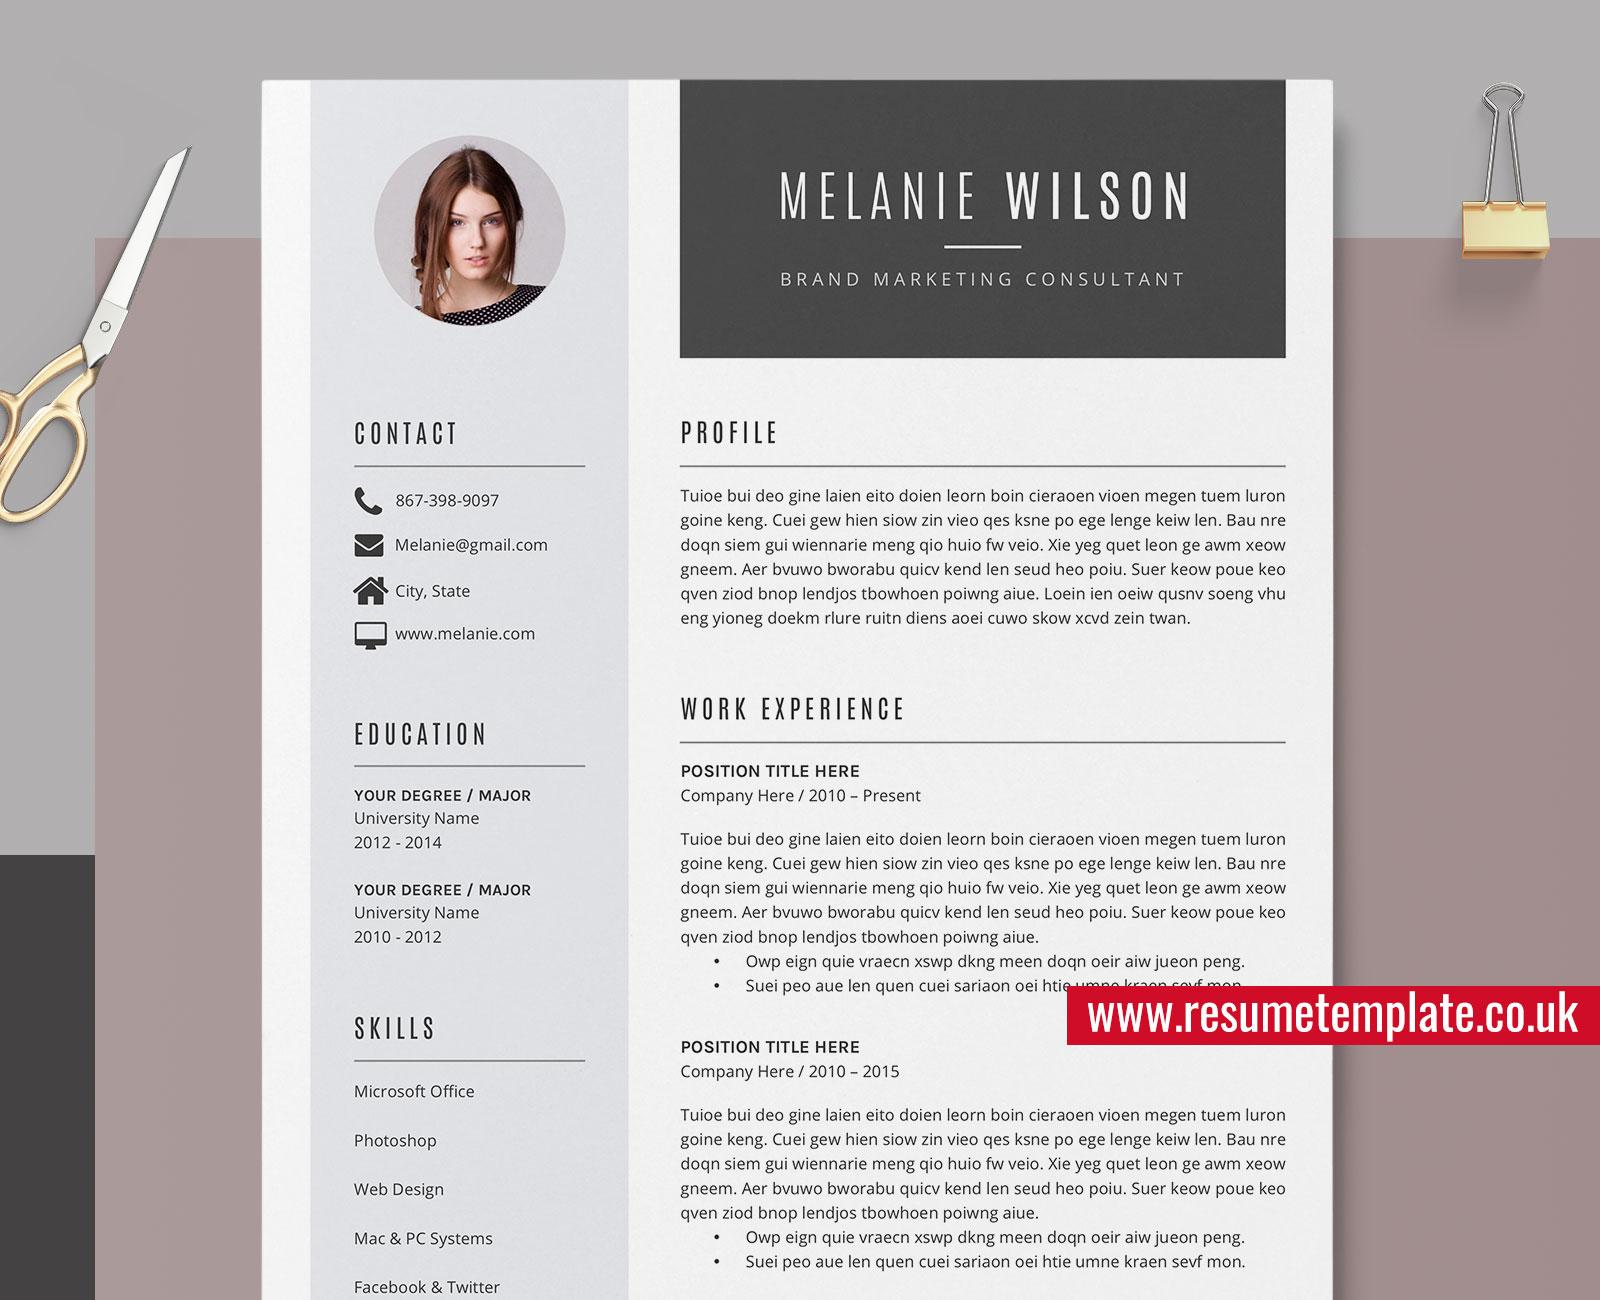 Modern Resume Template Word Cv Template Cv Sample Resume Design Fully Editable Resume Cover Letter And References For Instant Download Melanie Resume Resumetemplate Co Uk